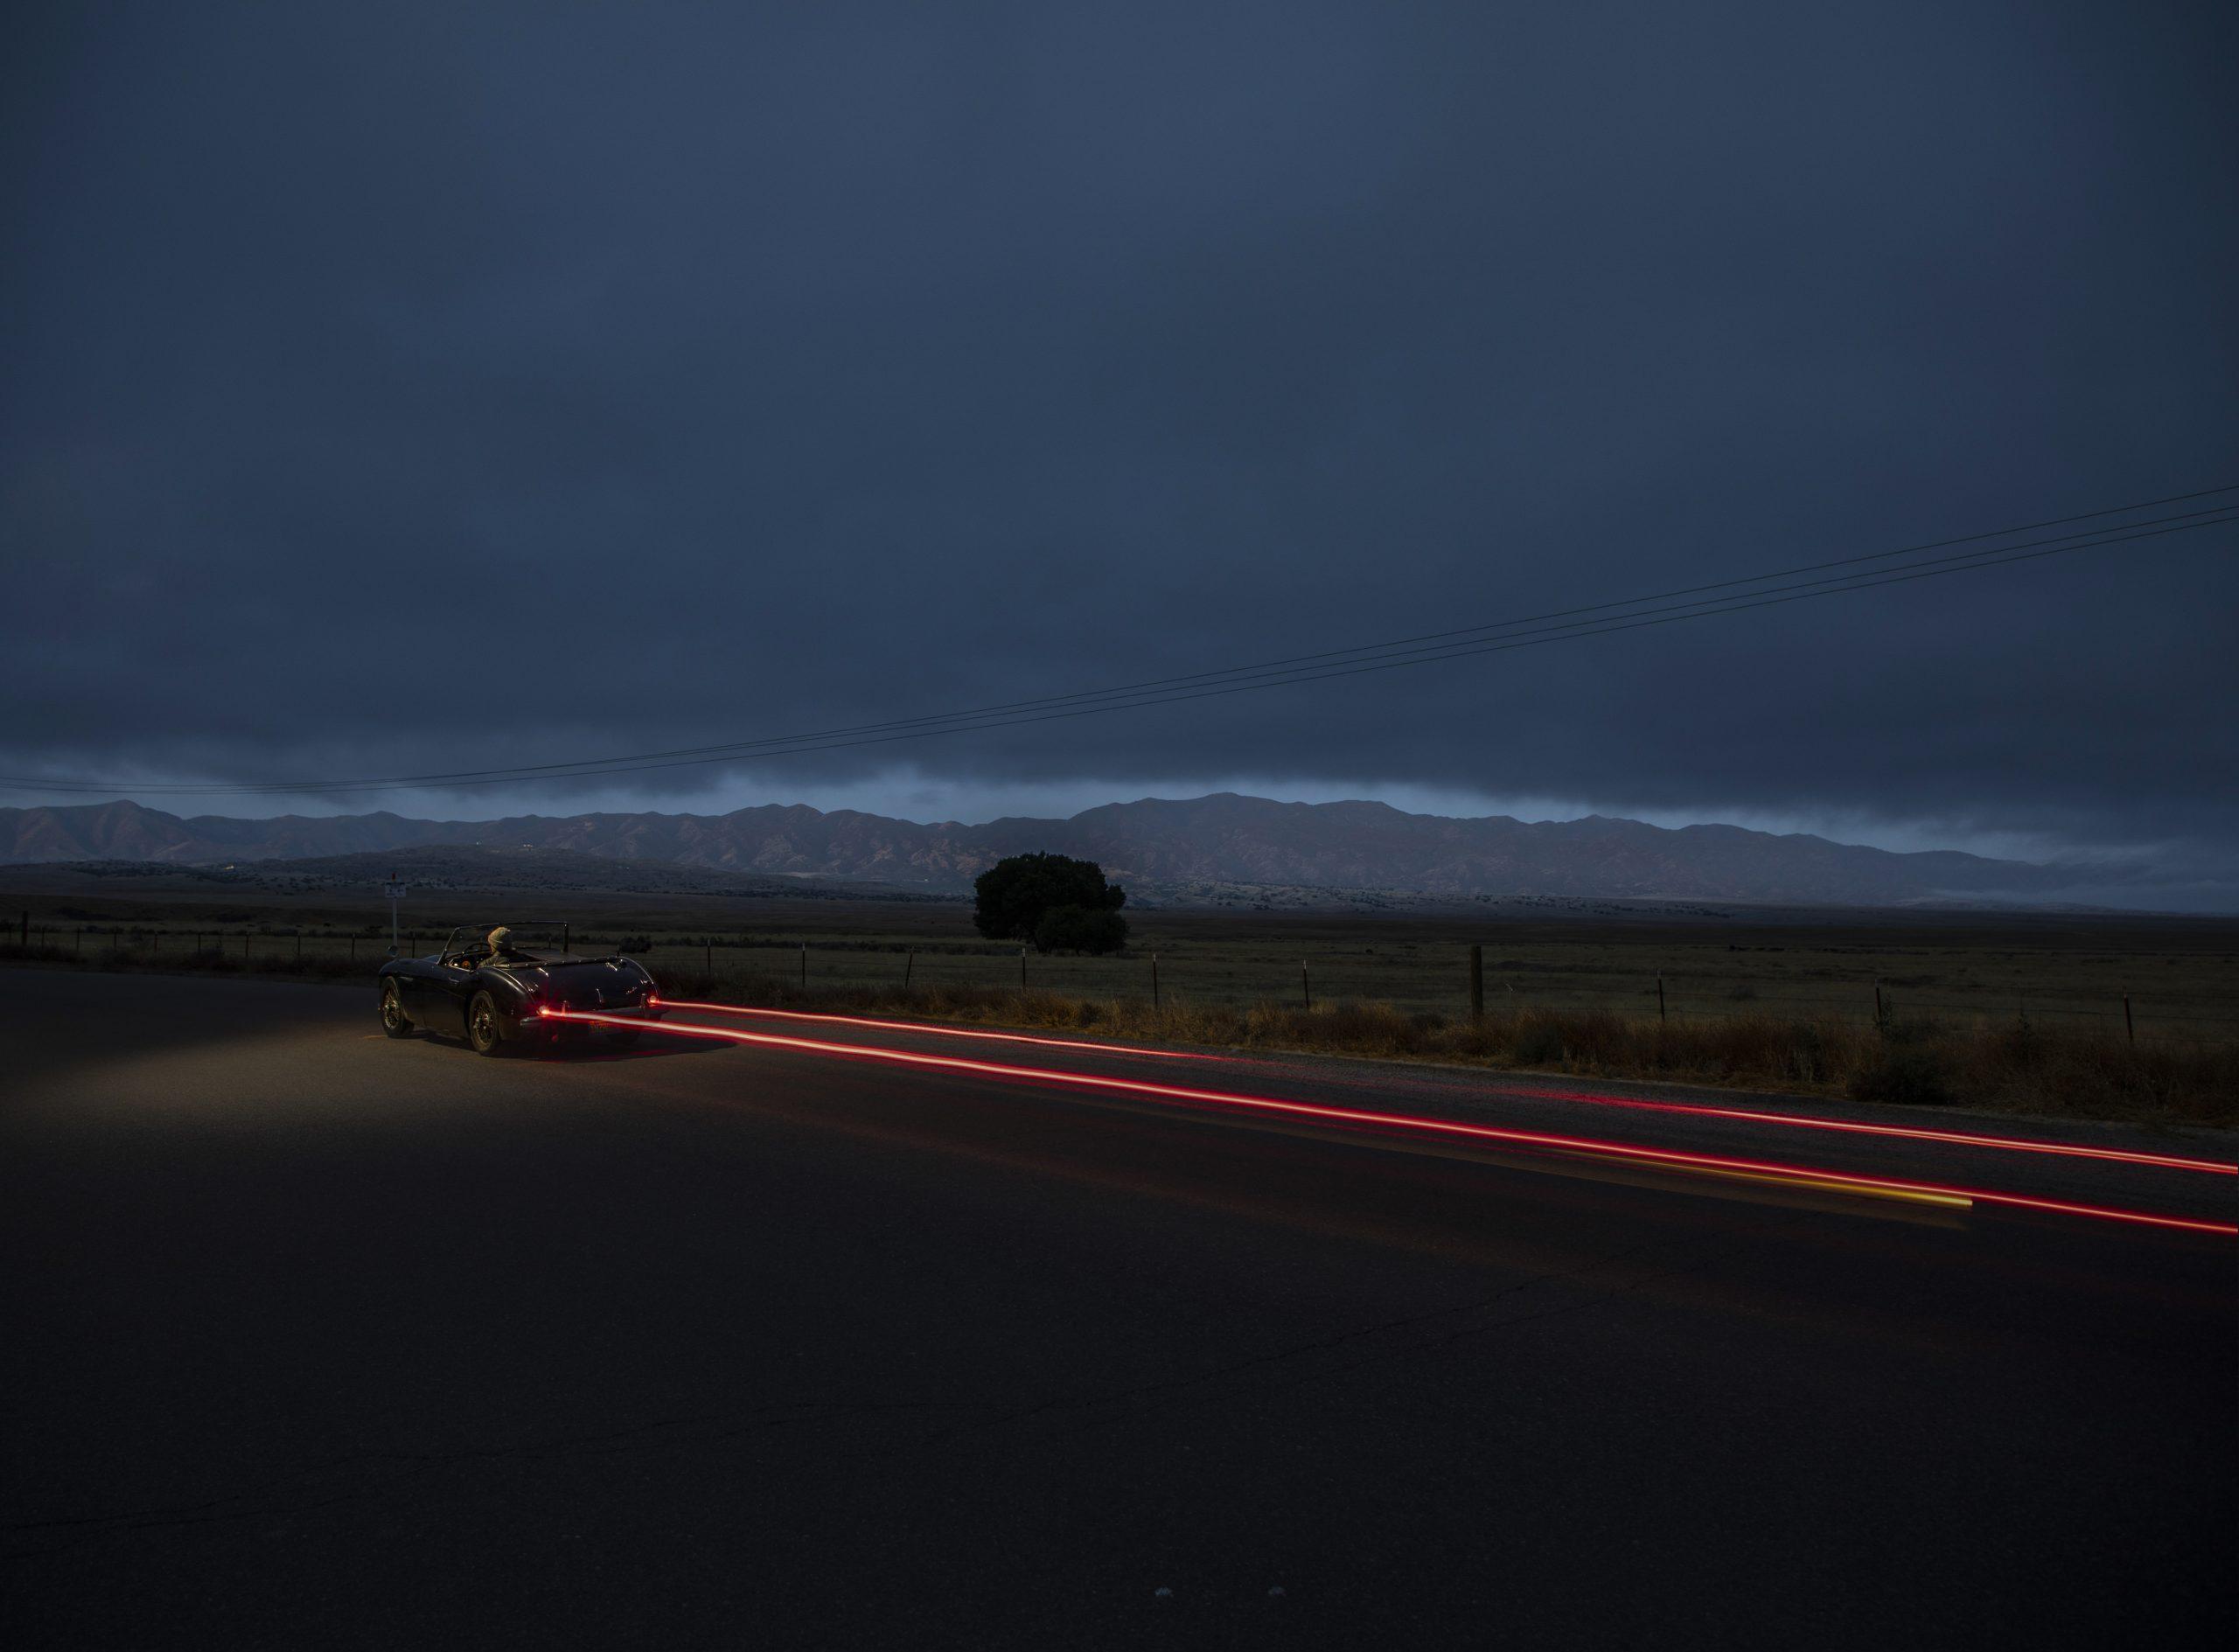 Austin-Healey night taillight blur